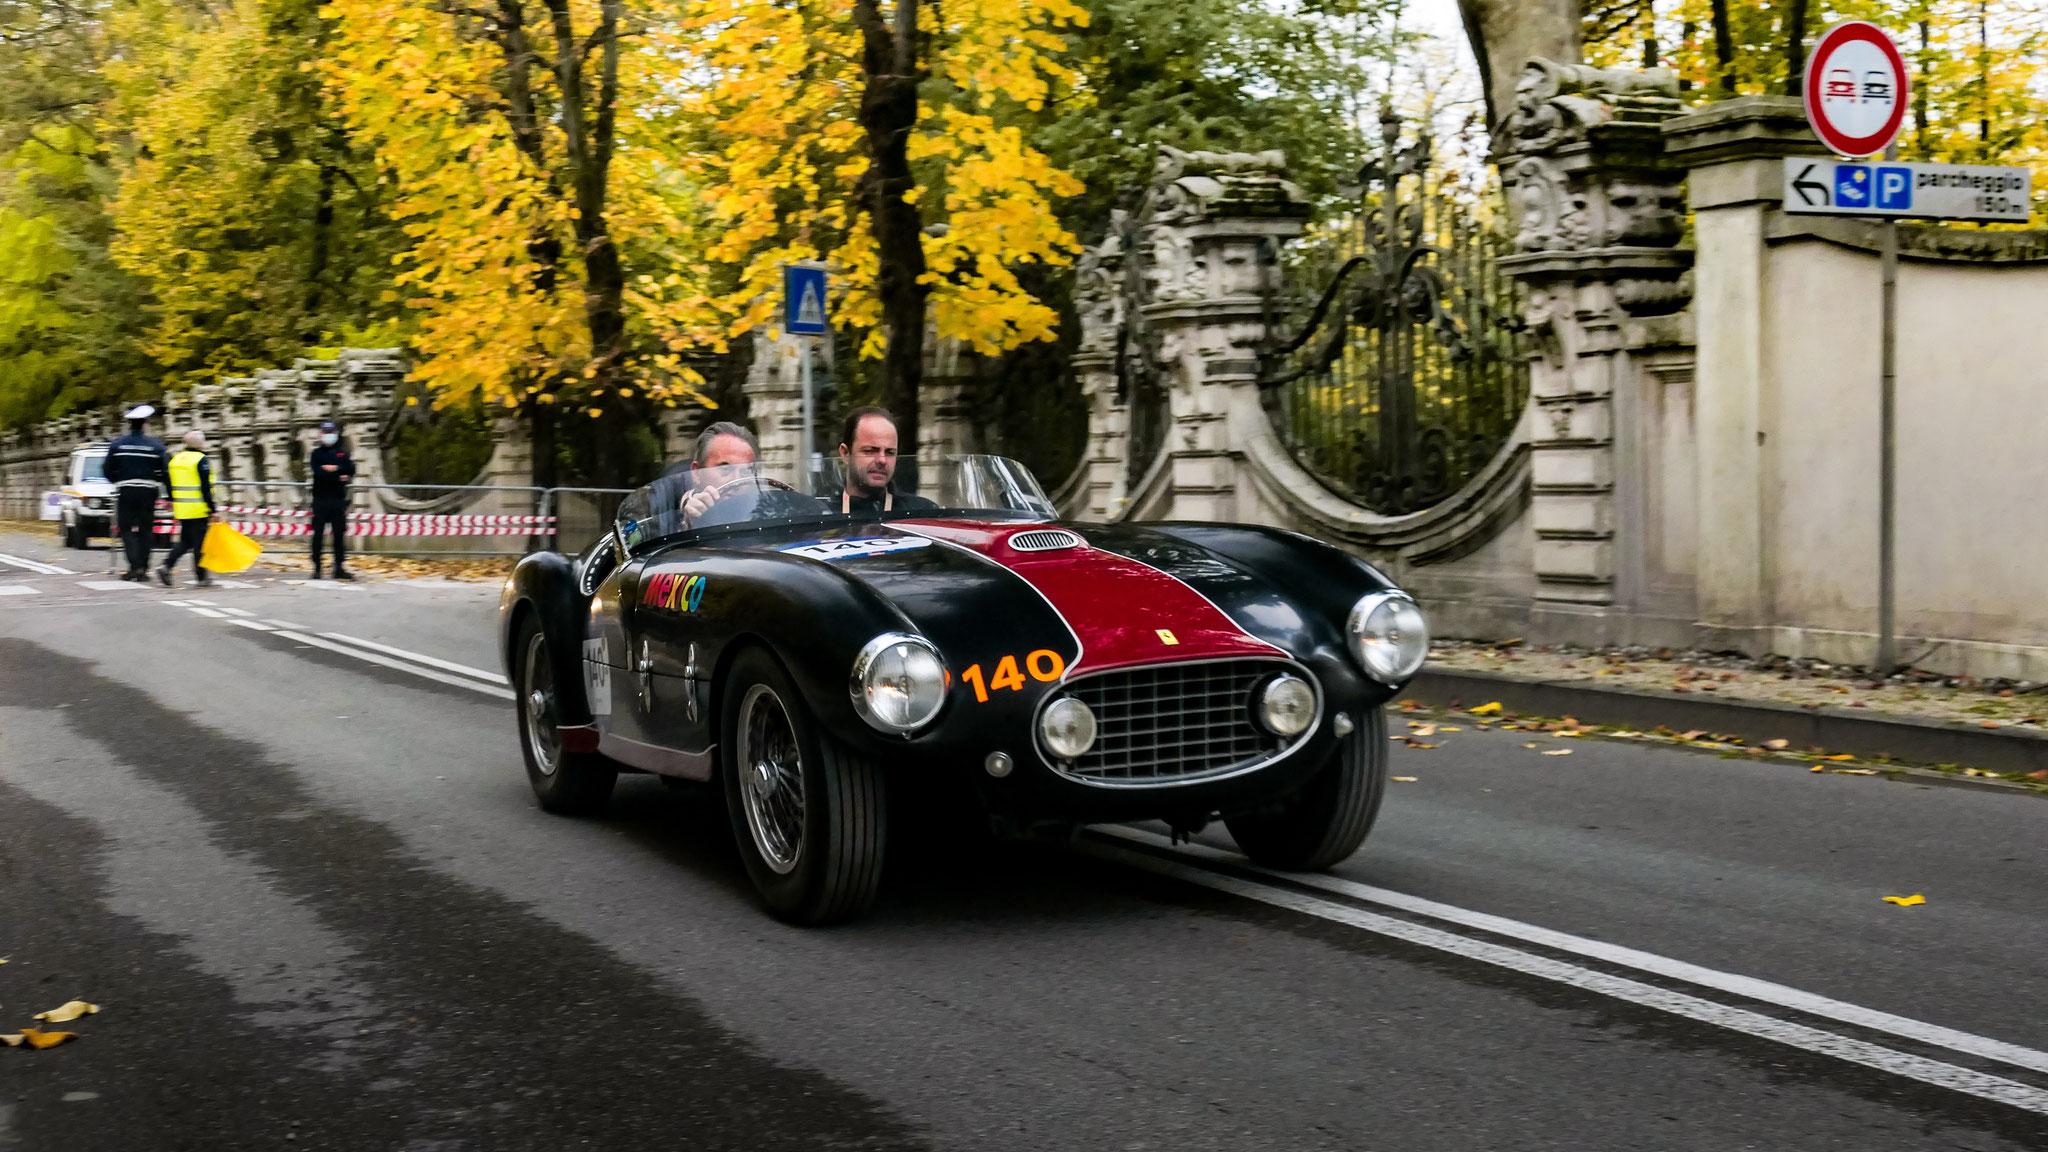 Ferrari 166 Inter Spider Corsa - 892-XVK (GB)